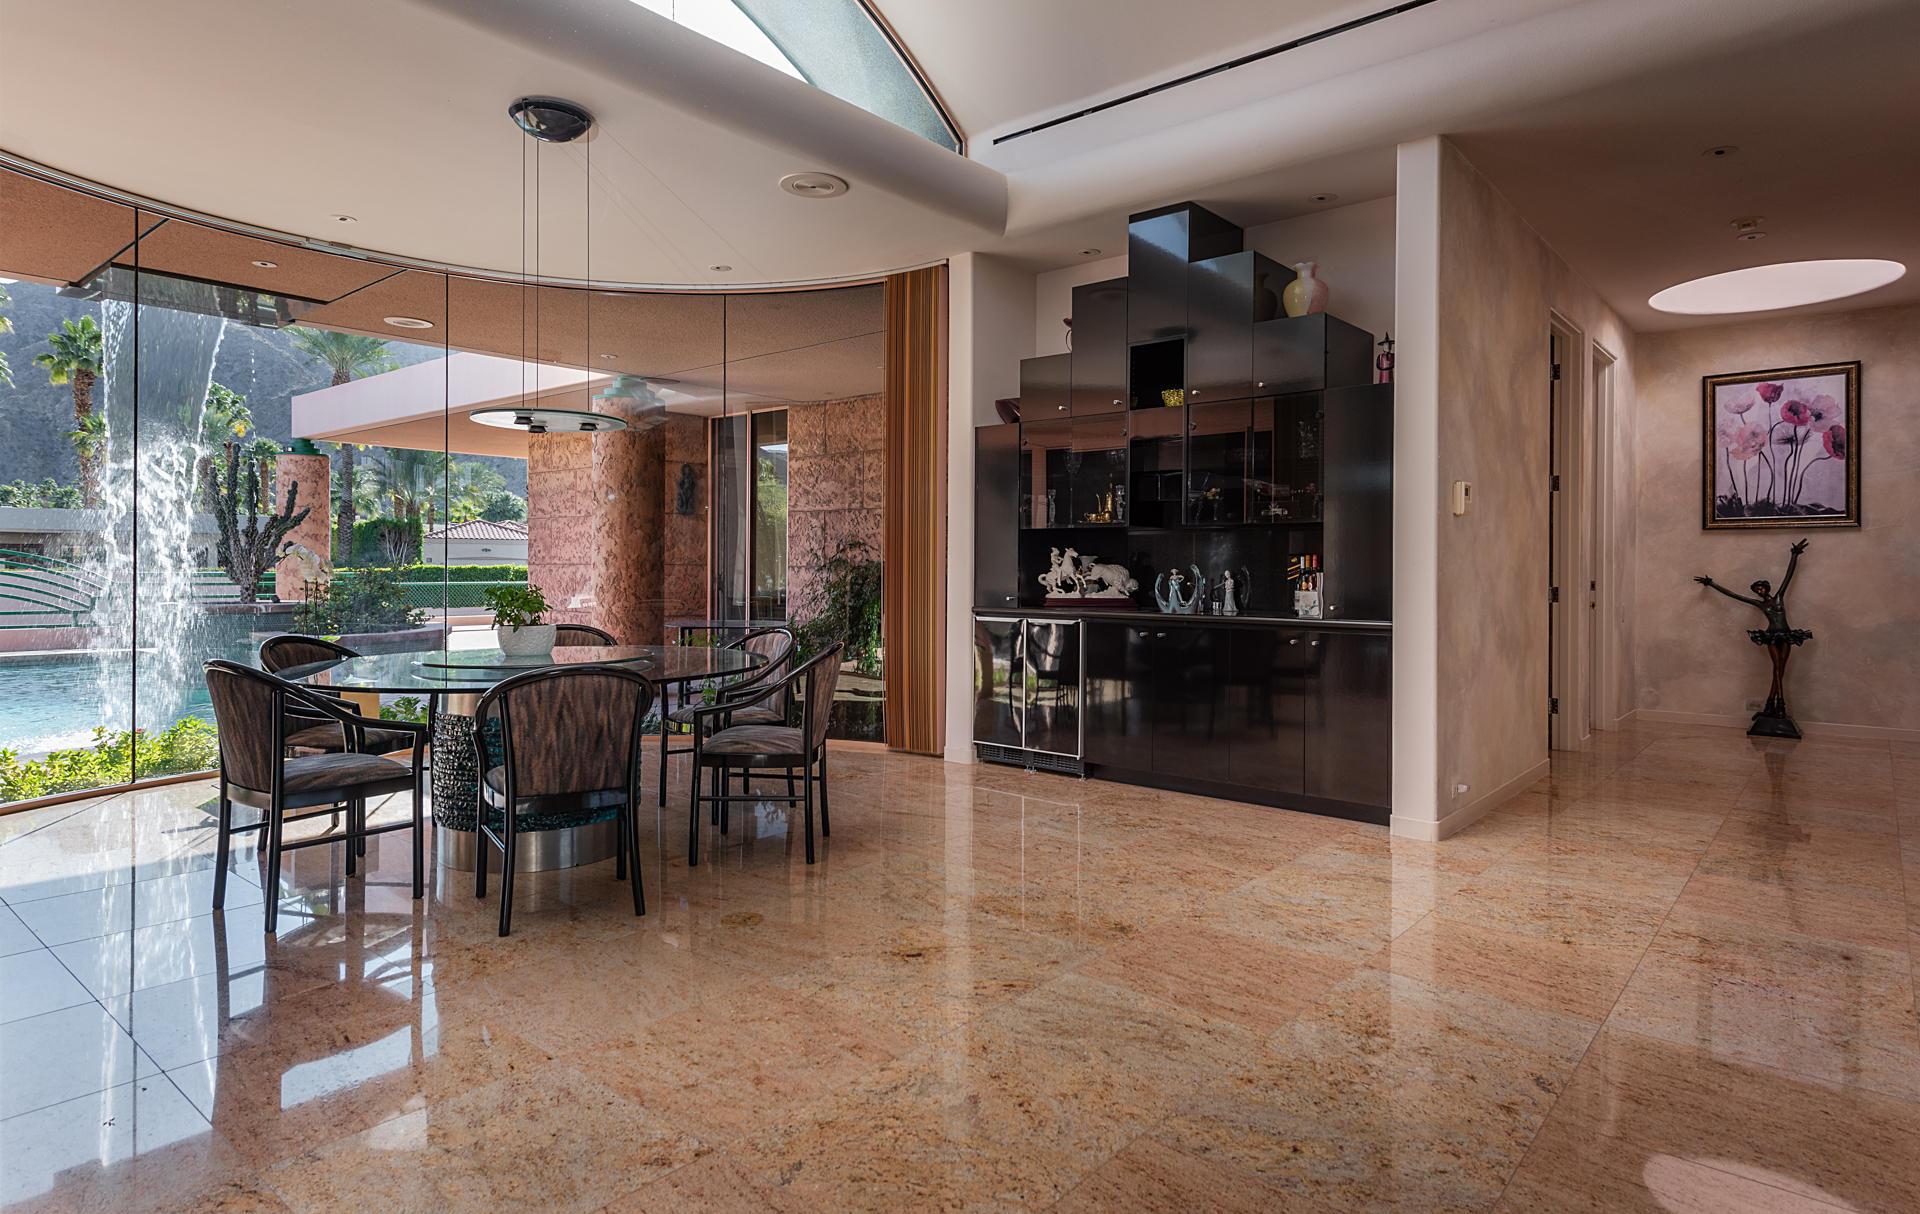 77100 Sandpiper Drive, Indian Wells, California 92210, 4 Bedrooms Bedrooms, ,6 BathroomsBathrooms,Residential,For Sale,77100 Sandpiper Drive,219037657